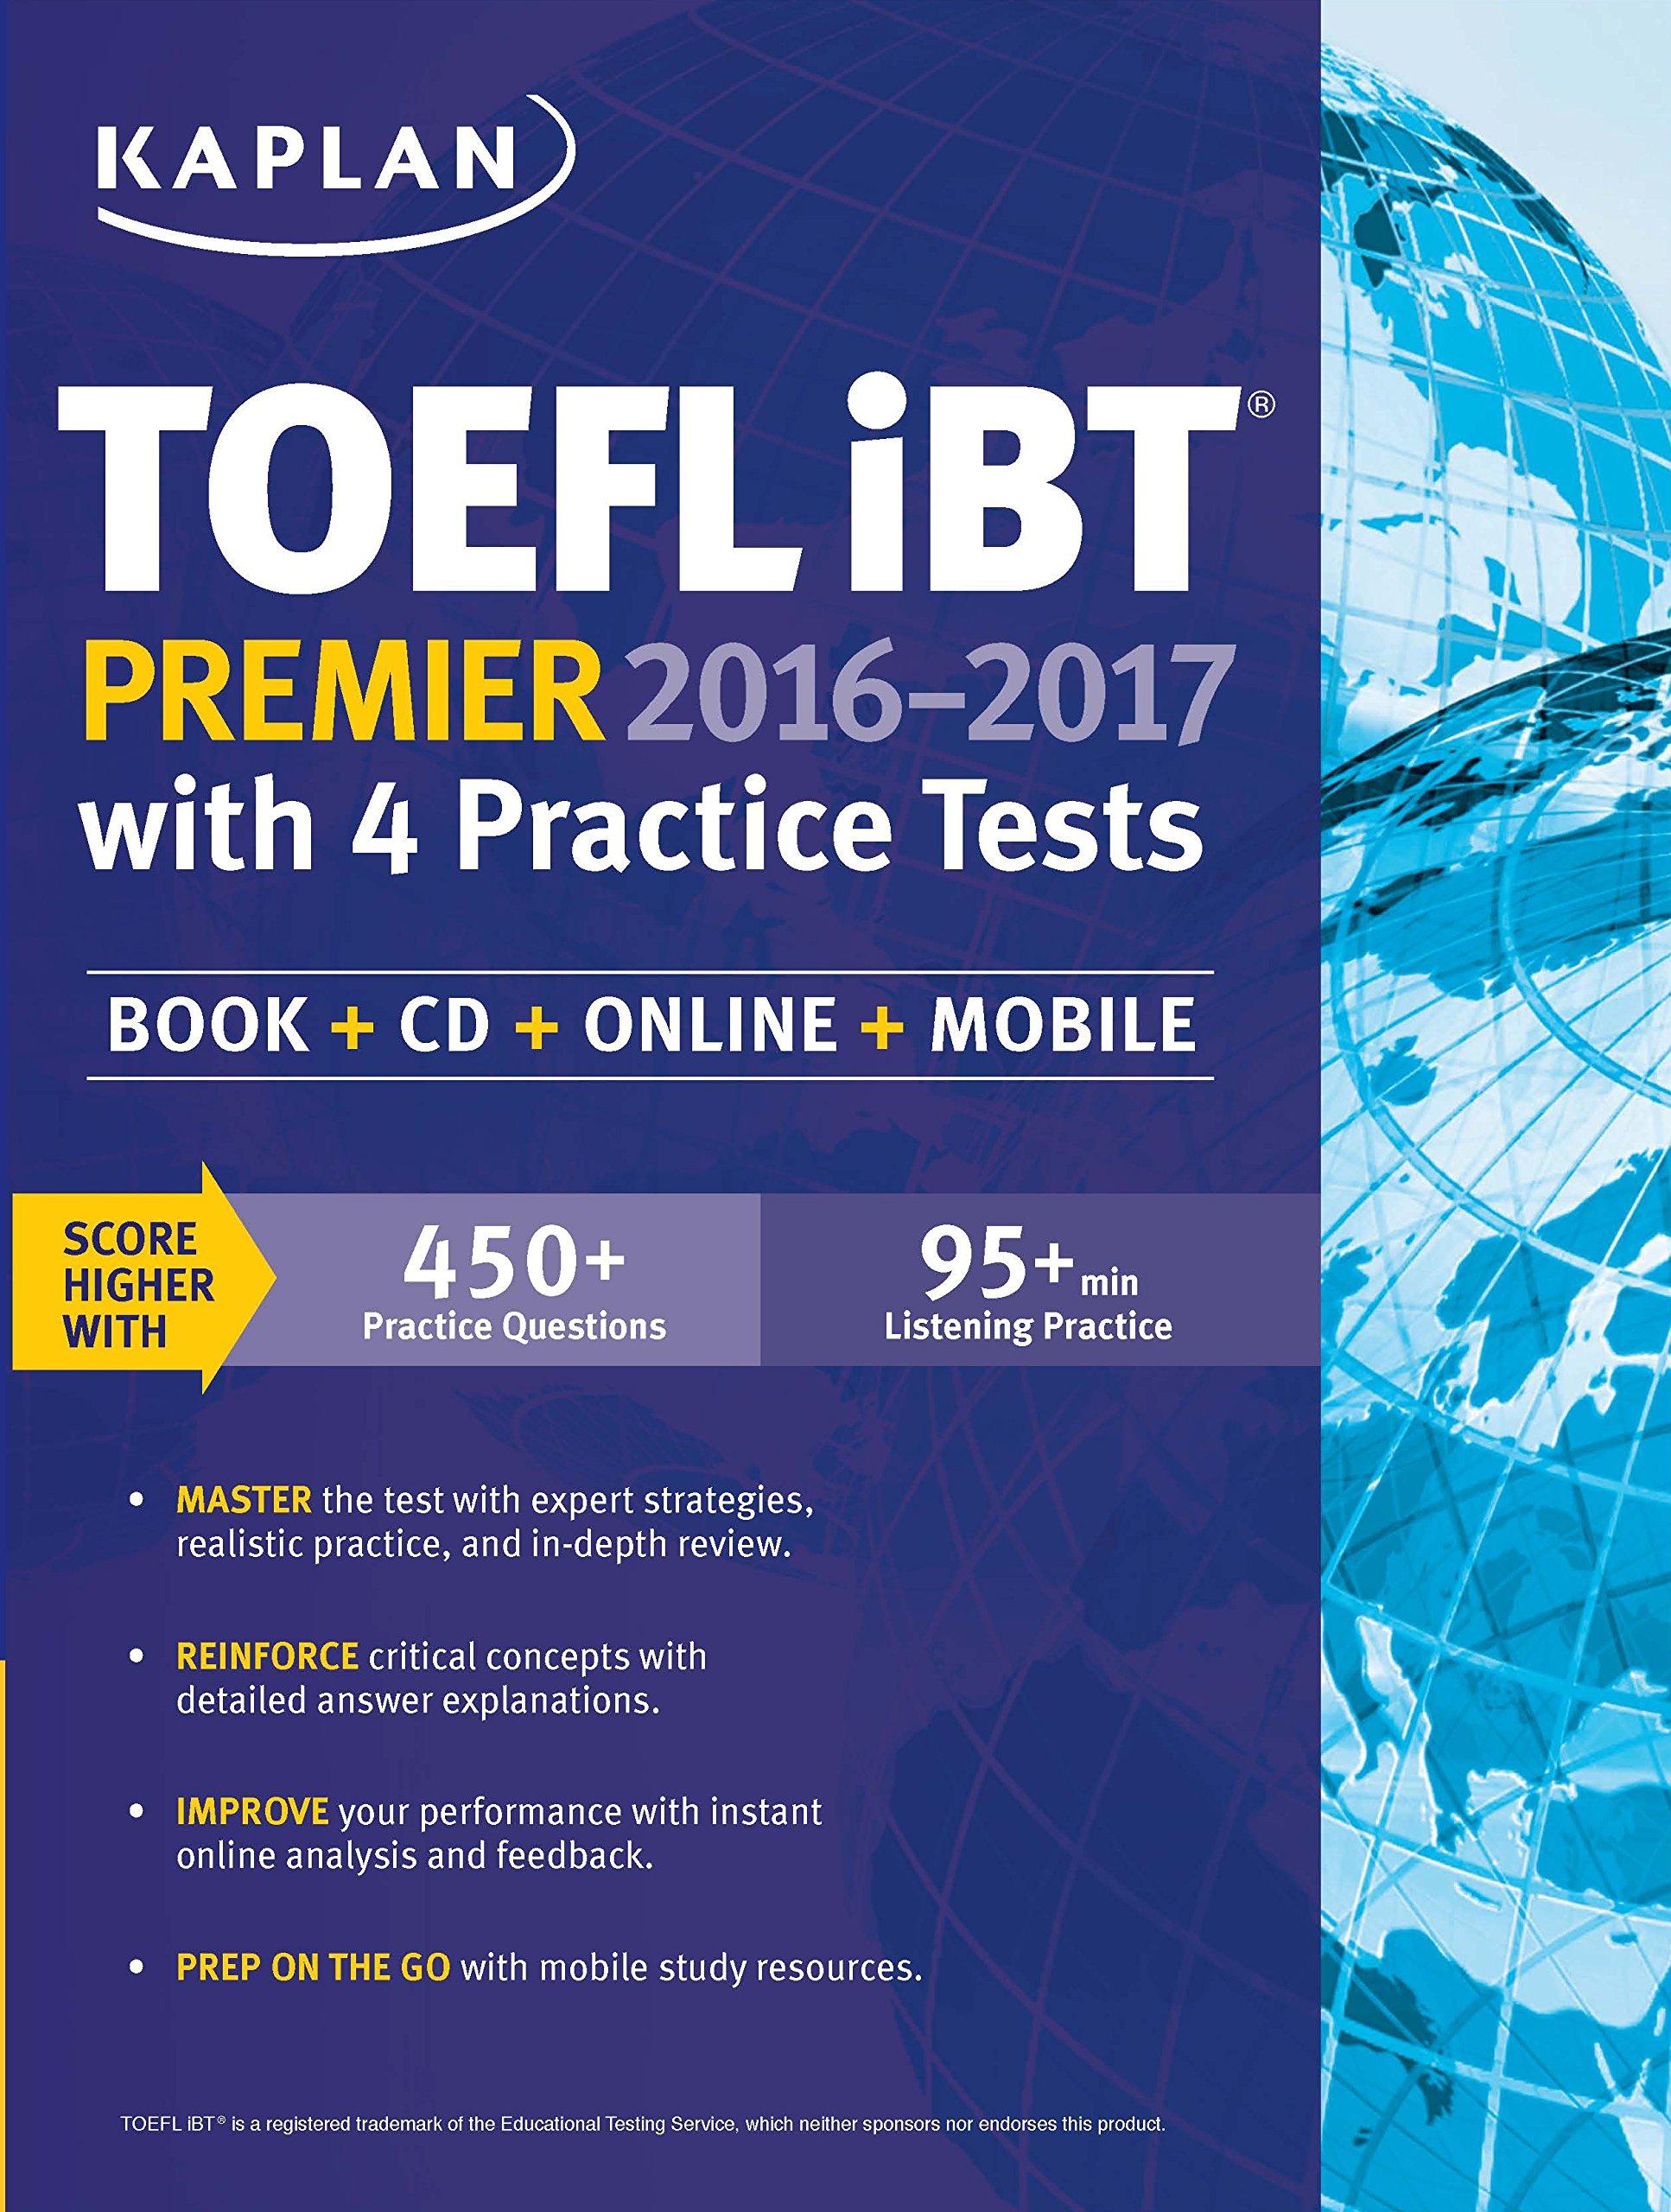 Kaplan TOEFL iBT Premier 2016-2017 with 4 Practice Tests ebook